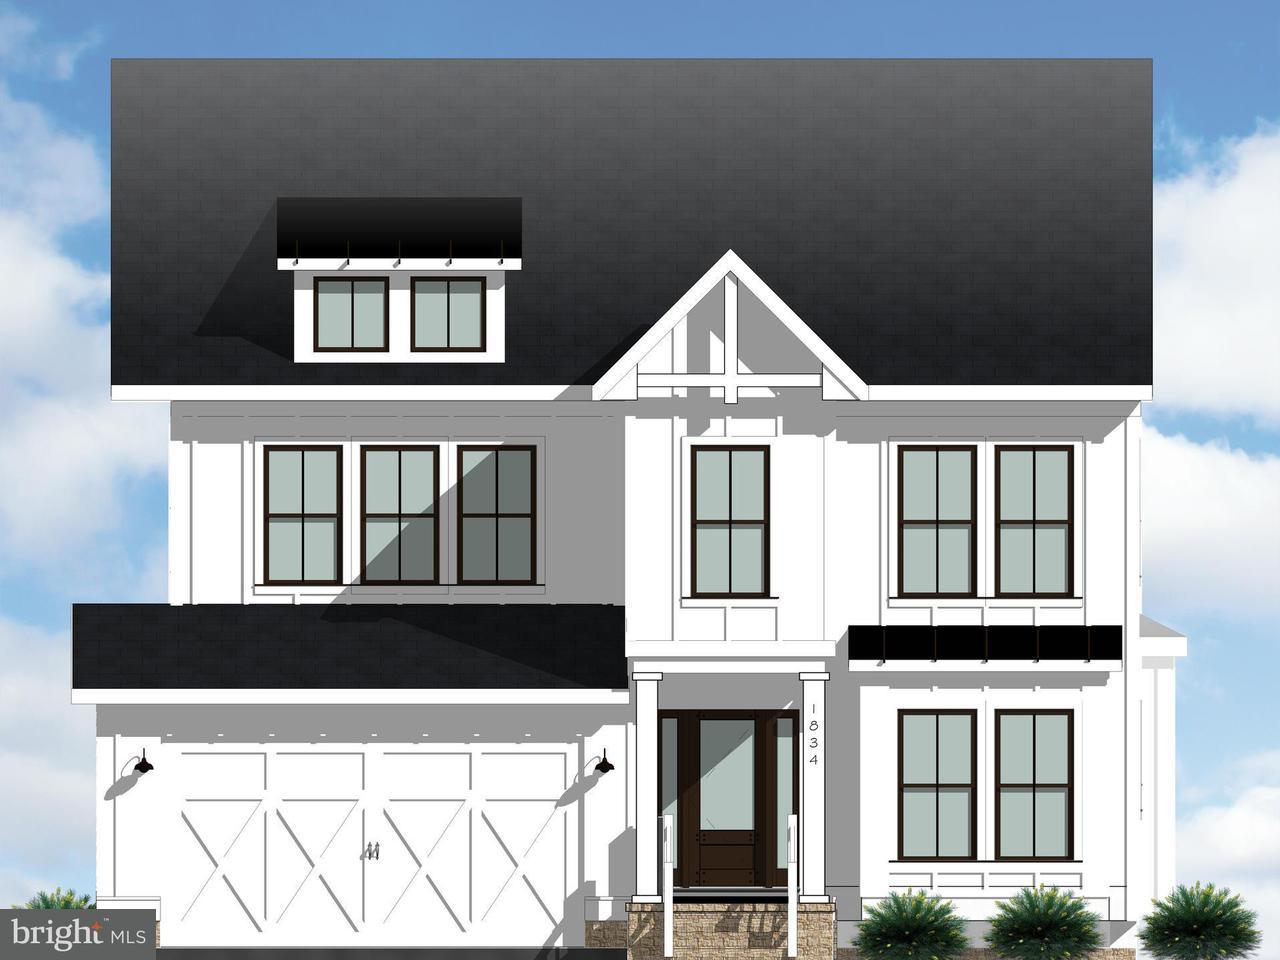 Single Family Home for Sale at 1834 KIRKWOOD Place 1834 KIRKWOOD Place Arlington, Virginia 22201 United States